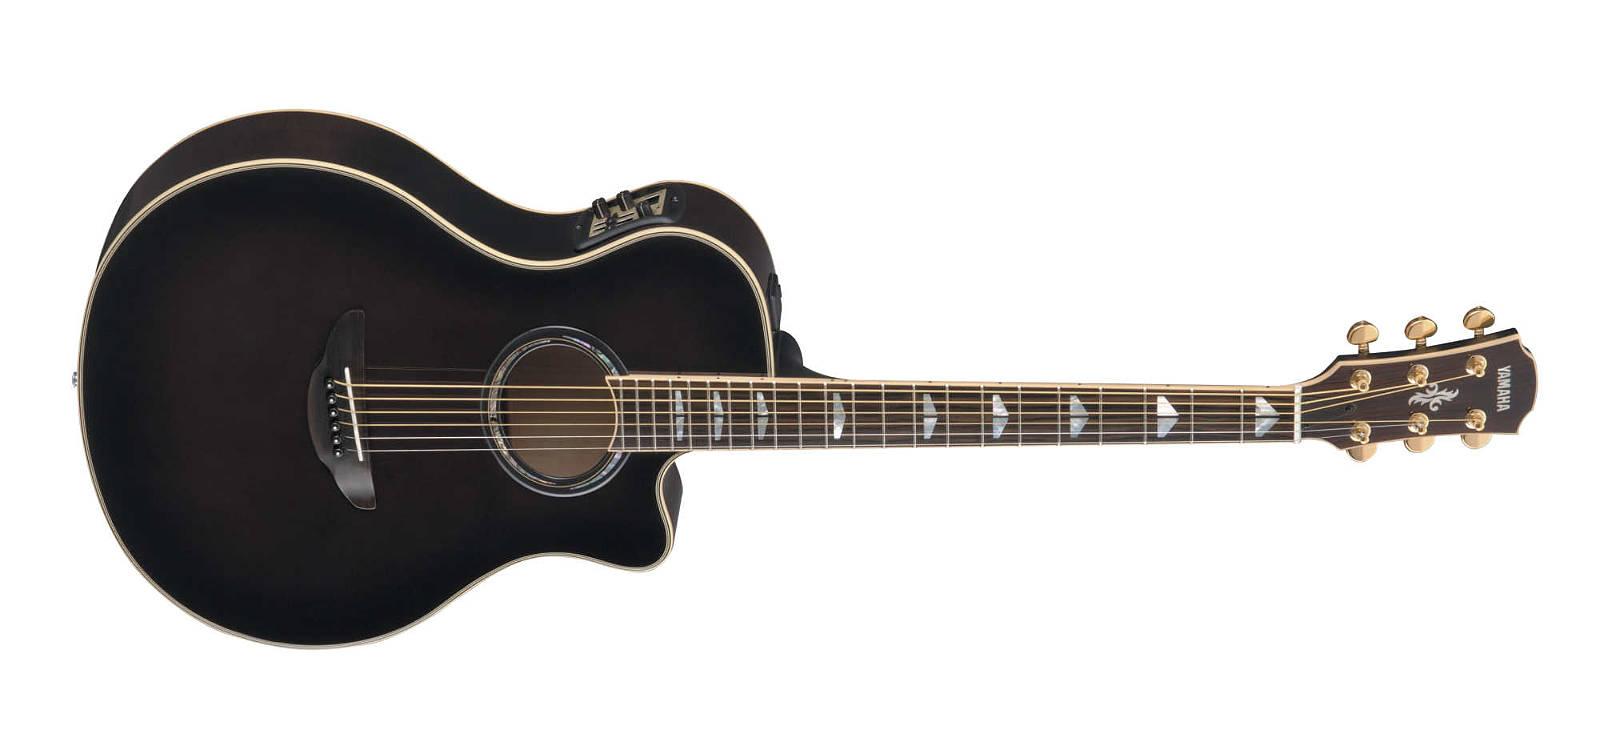 yamaha apx 900 mb elektro akustik gitarre mocha black. Black Bedroom Furniture Sets. Home Design Ideas